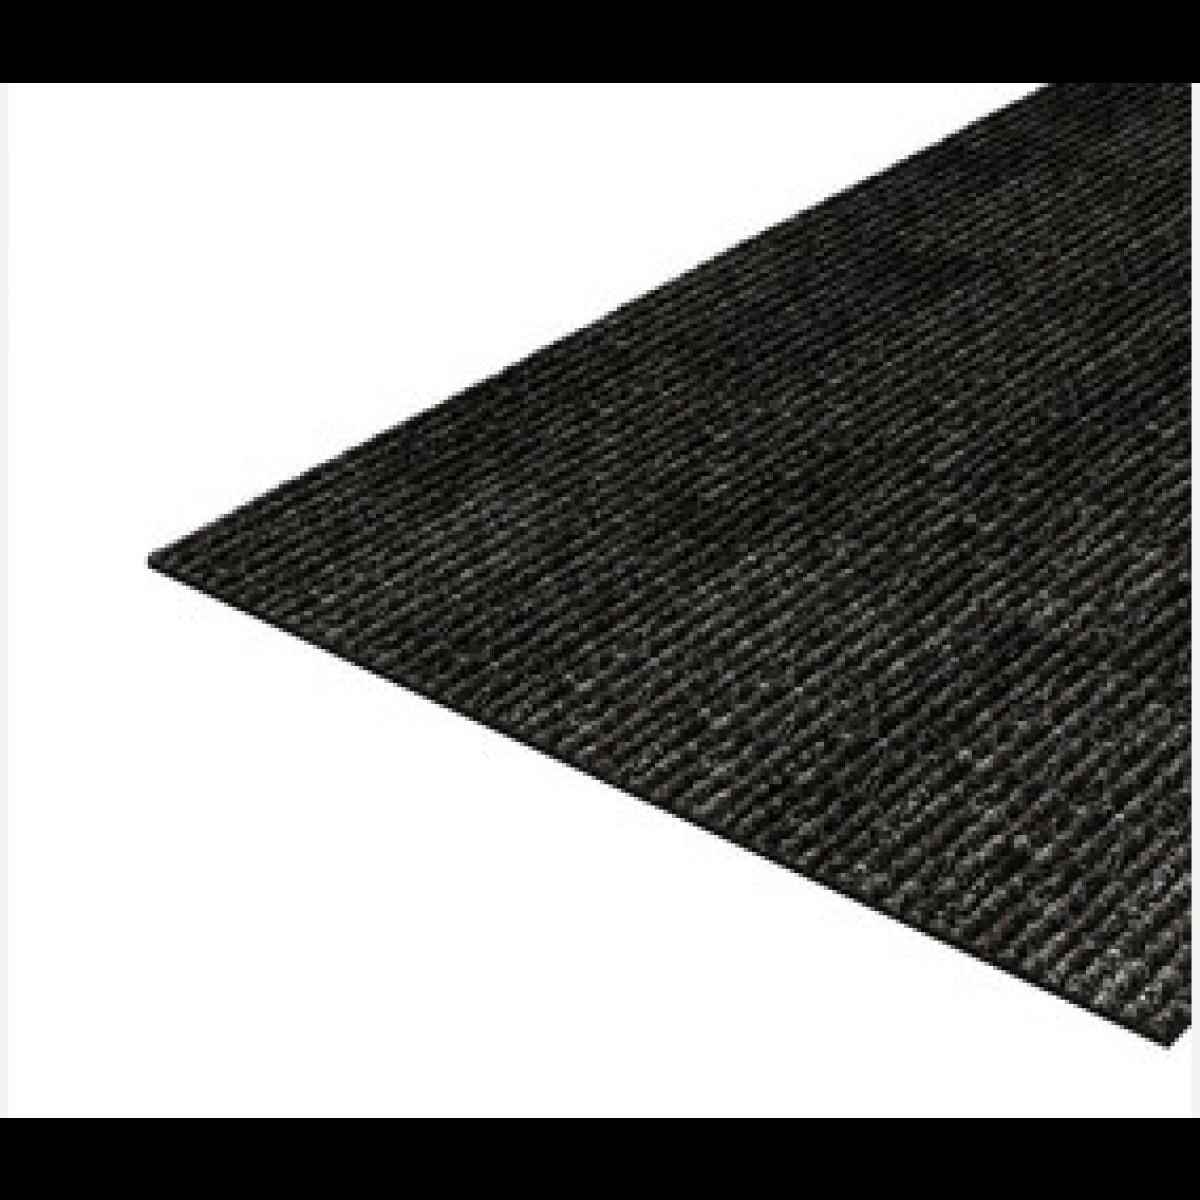 tapis brosse reps enter geggus sols et tapis de sols. Black Bedroom Furniture Sets. Home Design Ideas